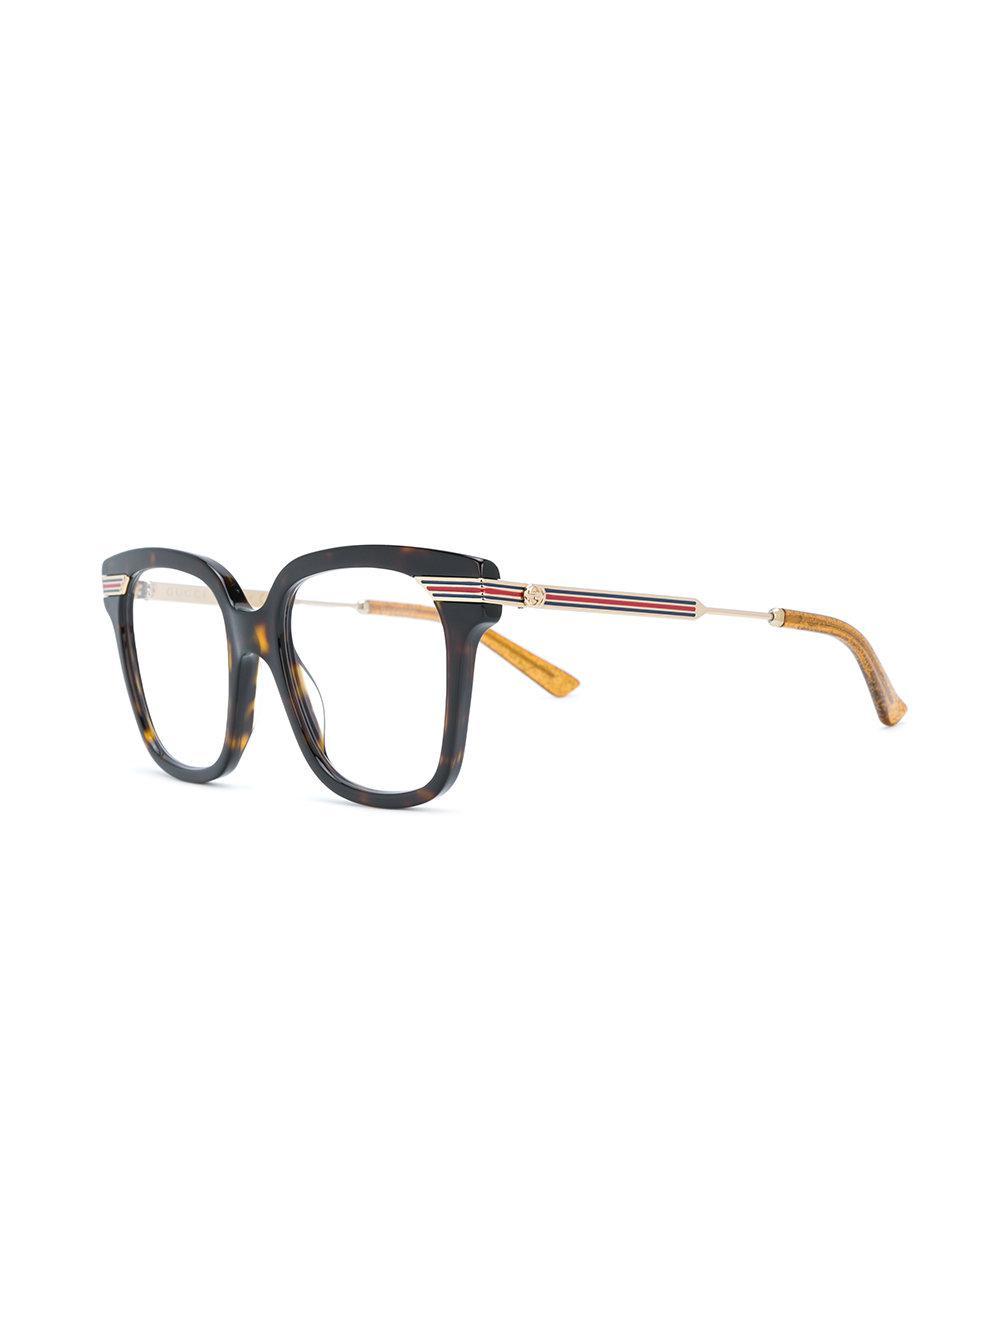 ca5a616008 Gucci - Brown Tortoiseshell Square Frame Glasses - Lyst. View fullscreen